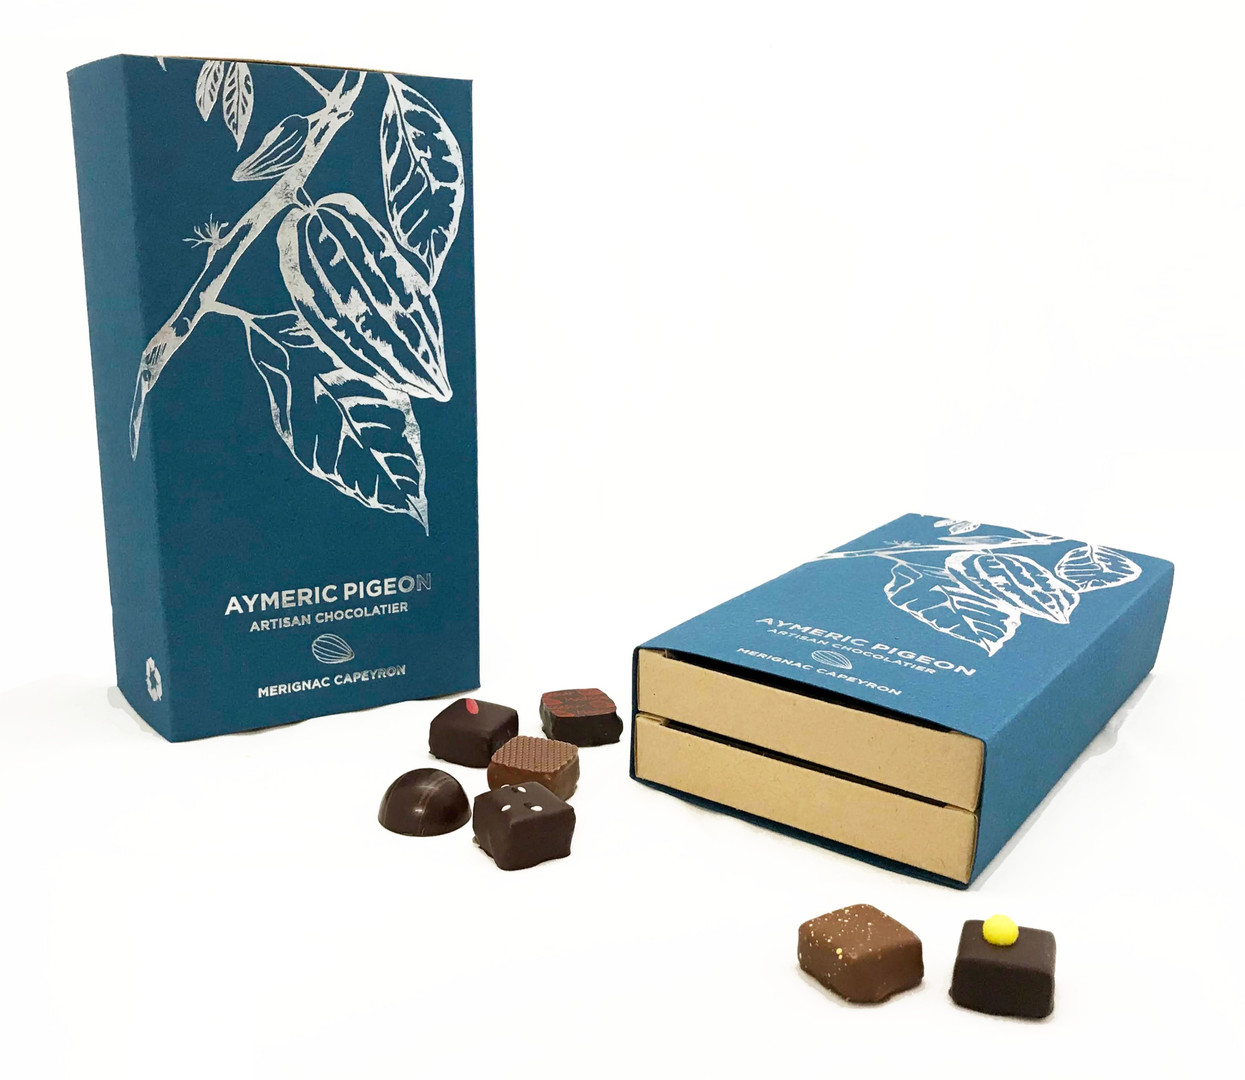 coffret%20bleu%20chocolat%20copy_edited.